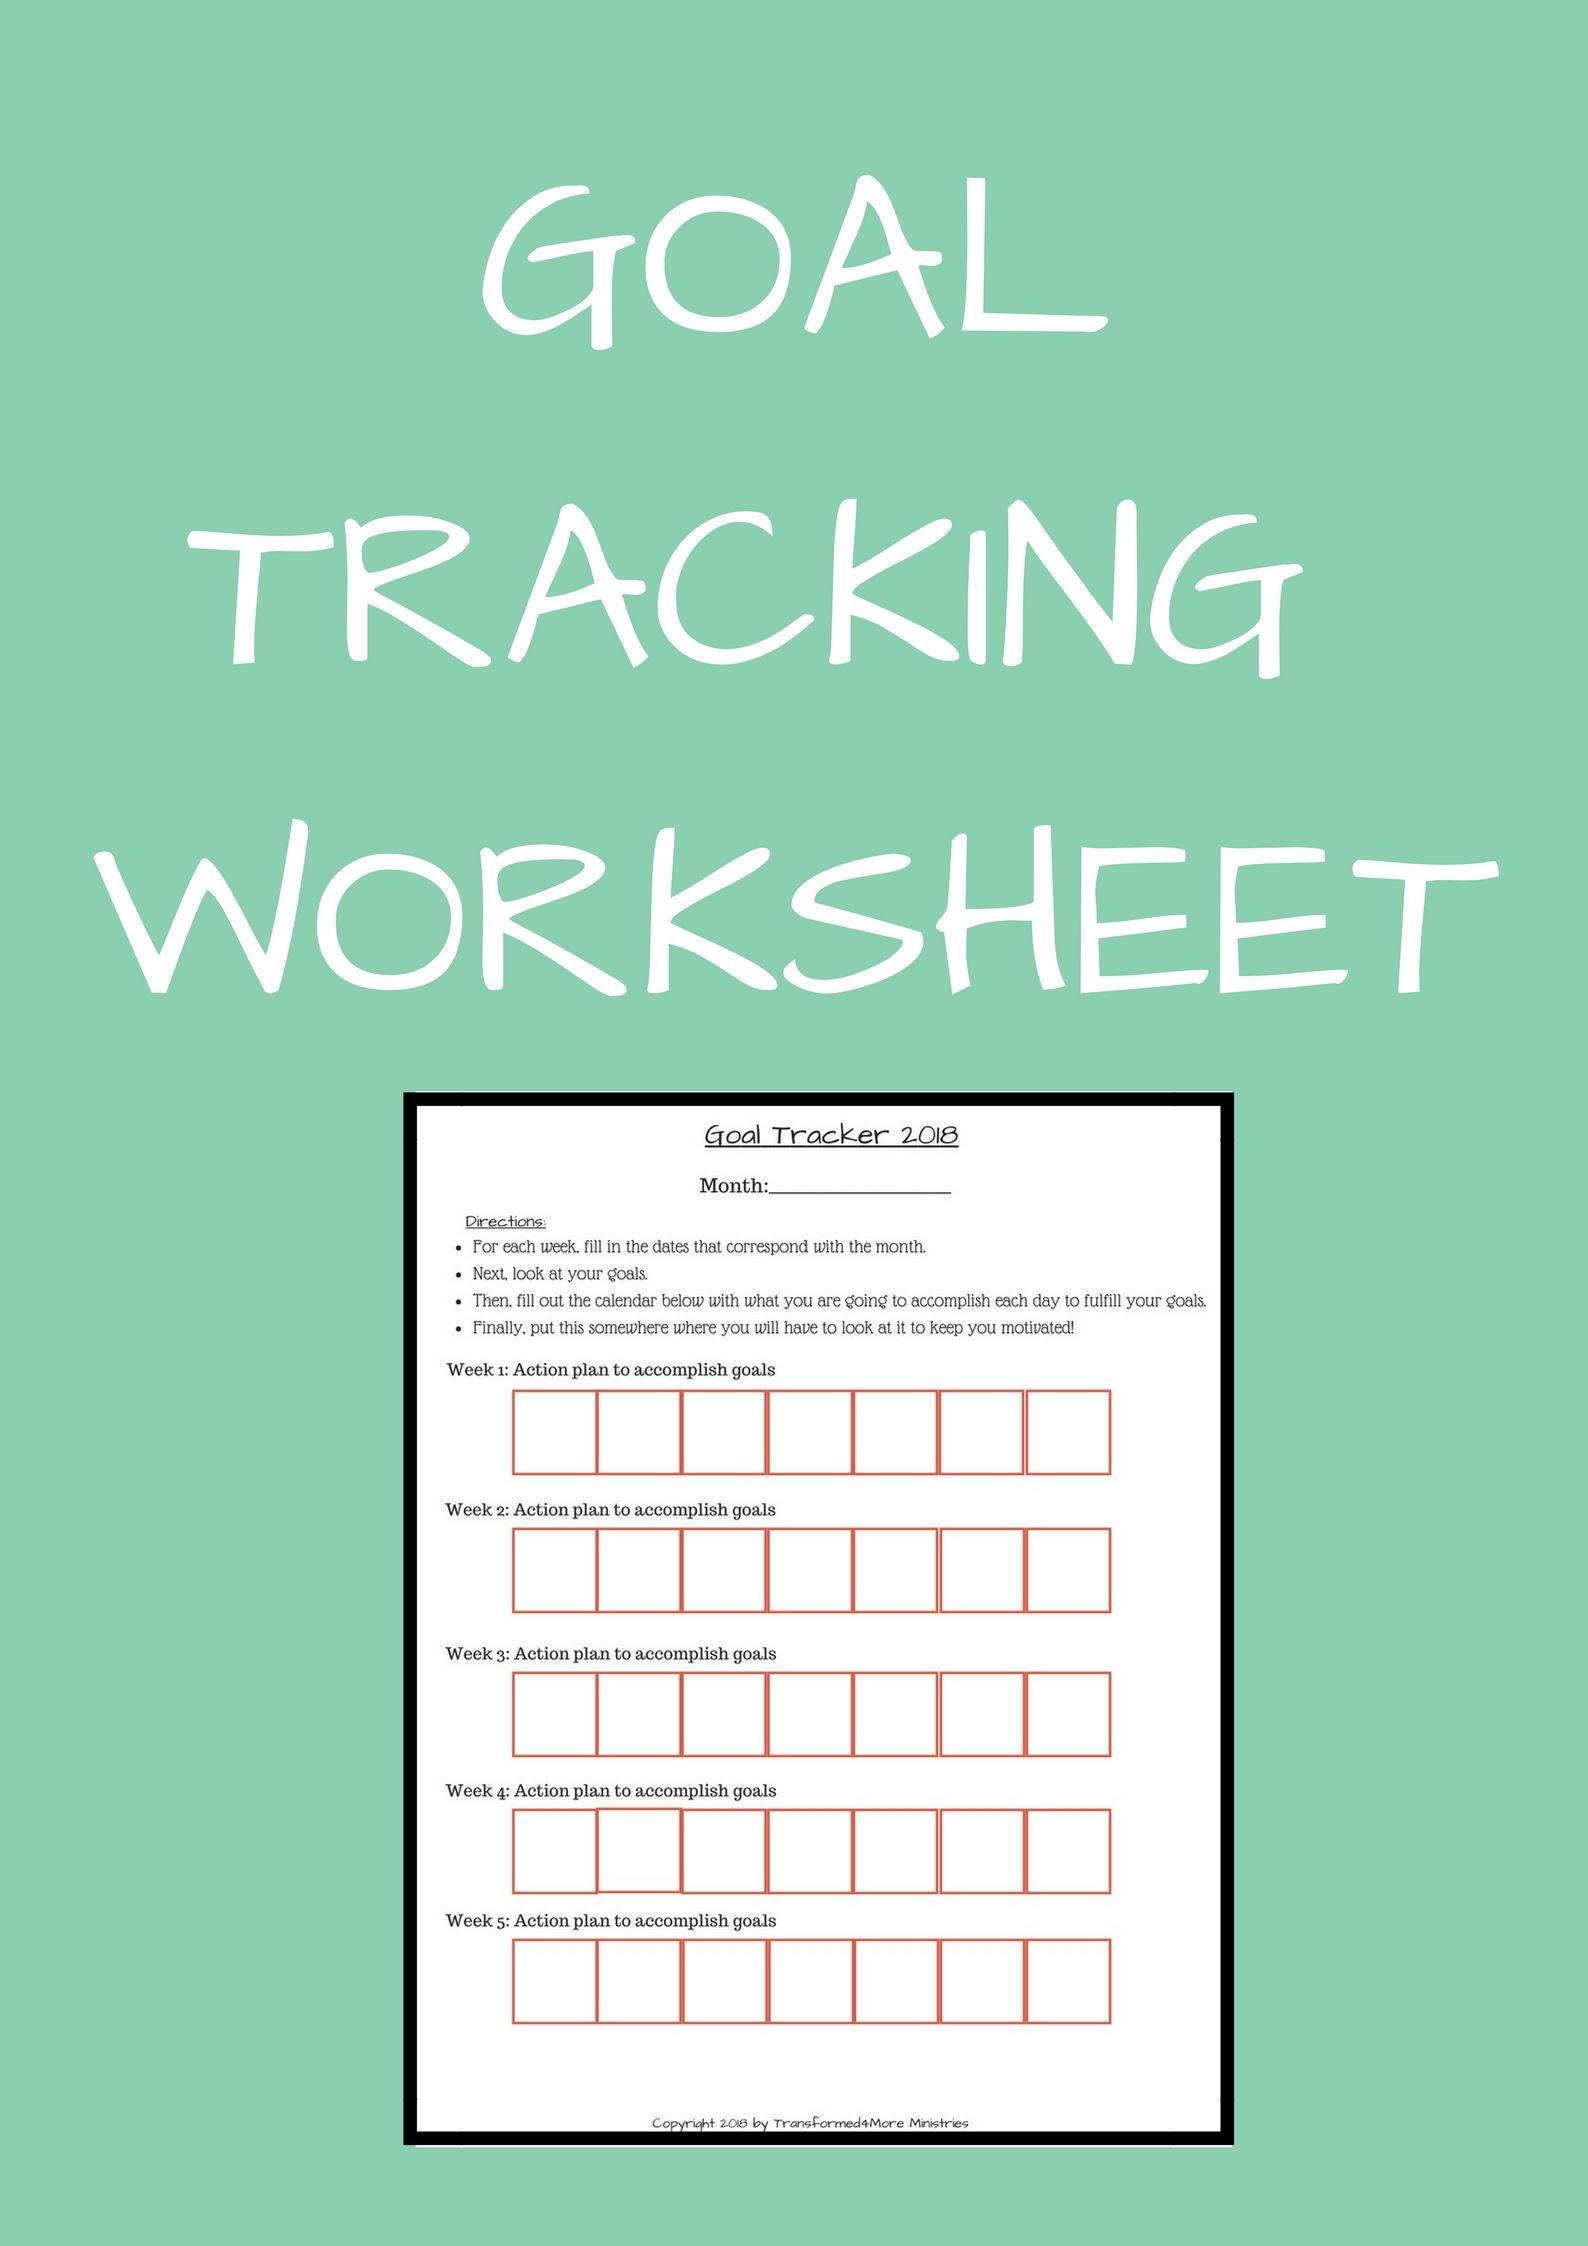 Goal Tracking Worksheet Transformed4more Free